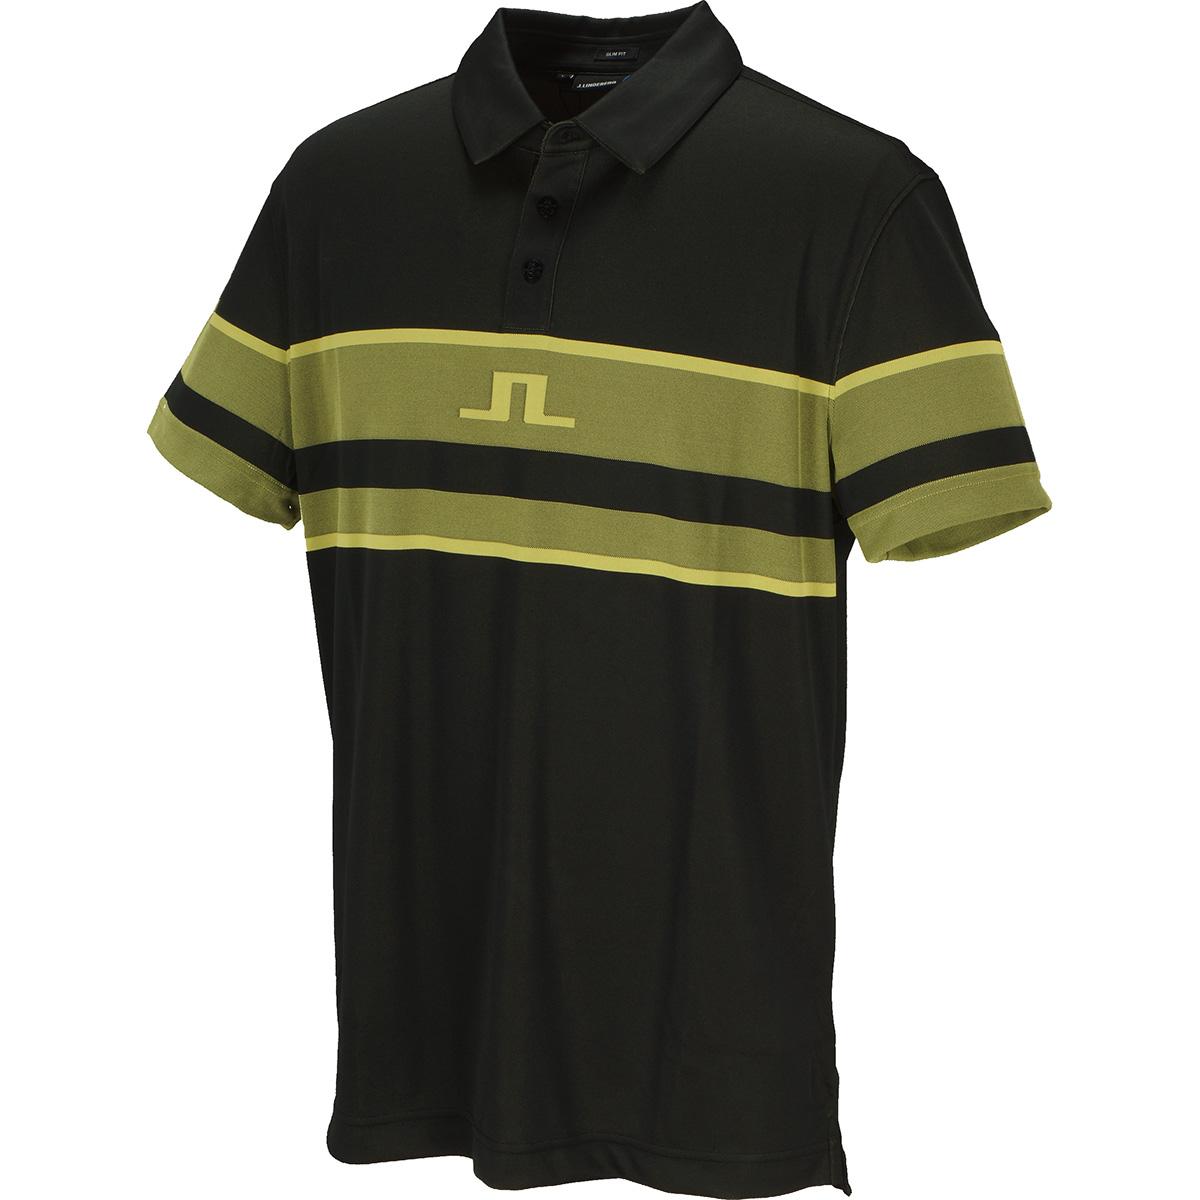 TX ジャガード 半袖ポロシャツ